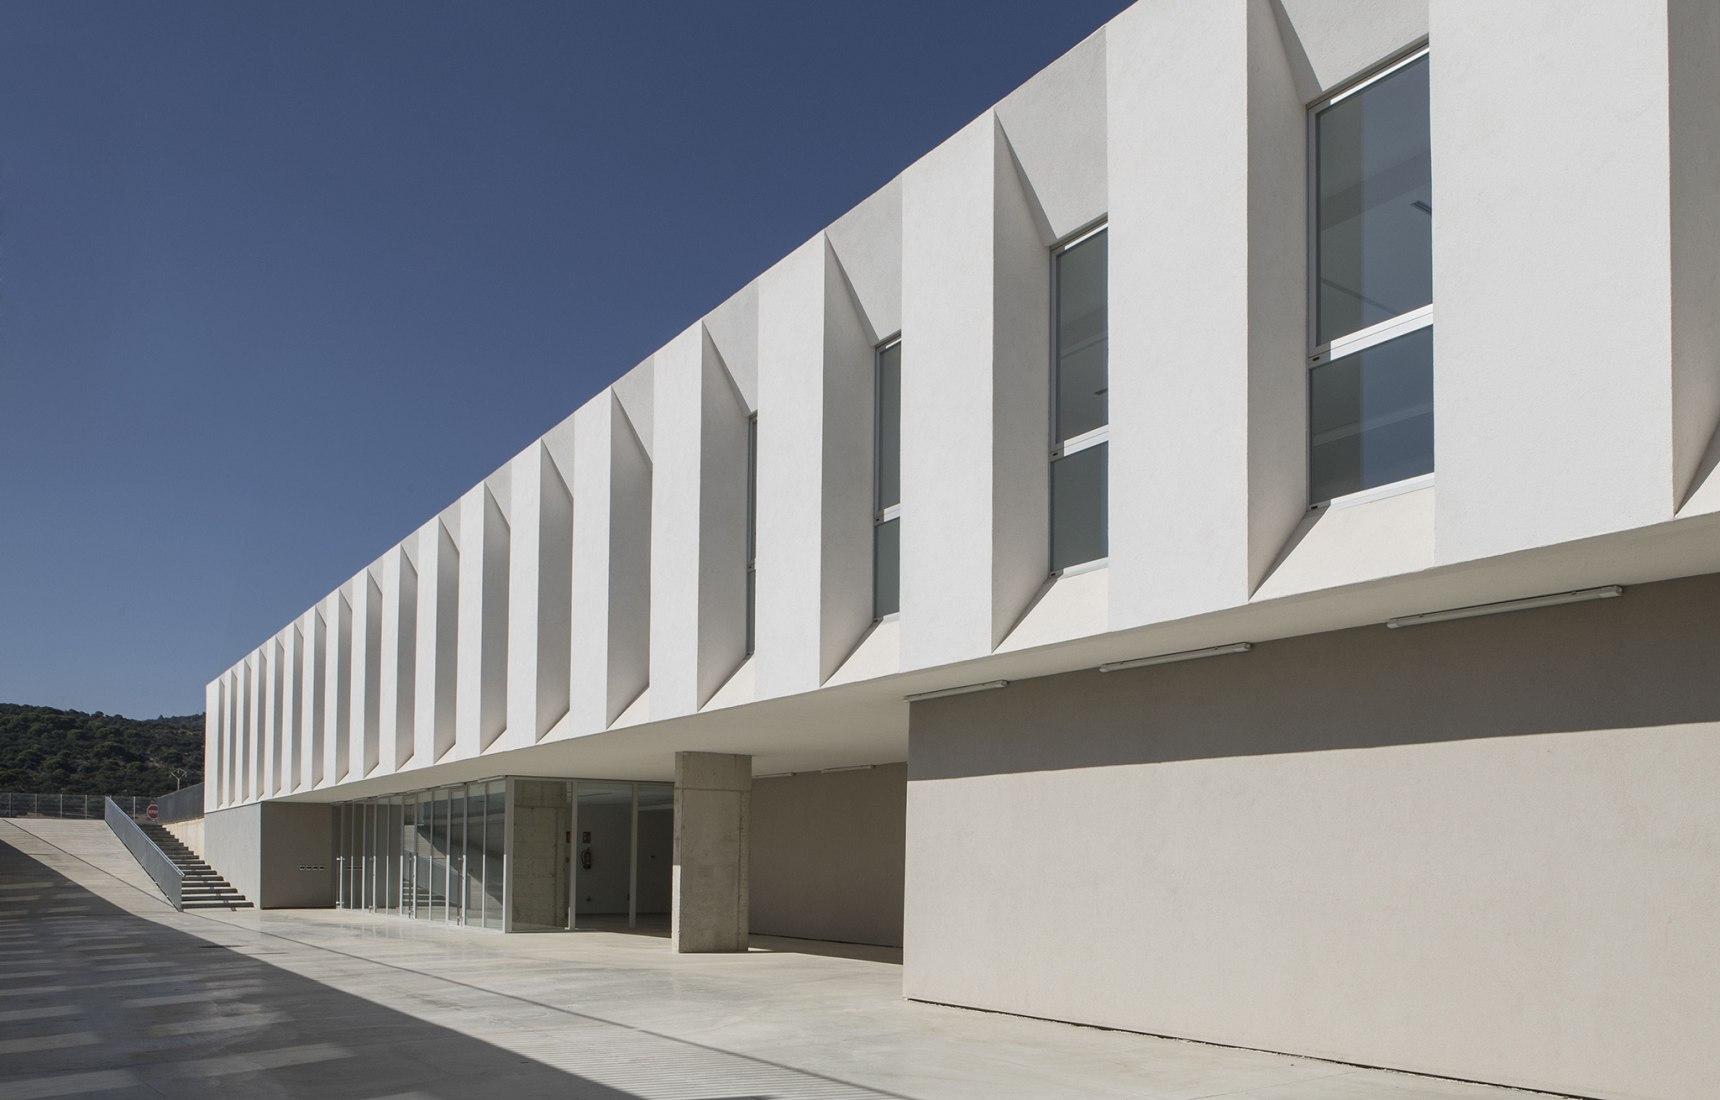 The bioincubadora by DUNAR arquitectos + Arquitectura Campos Alcaide. Photograph by RN Fotógrafos / Nicolás Yazigi.